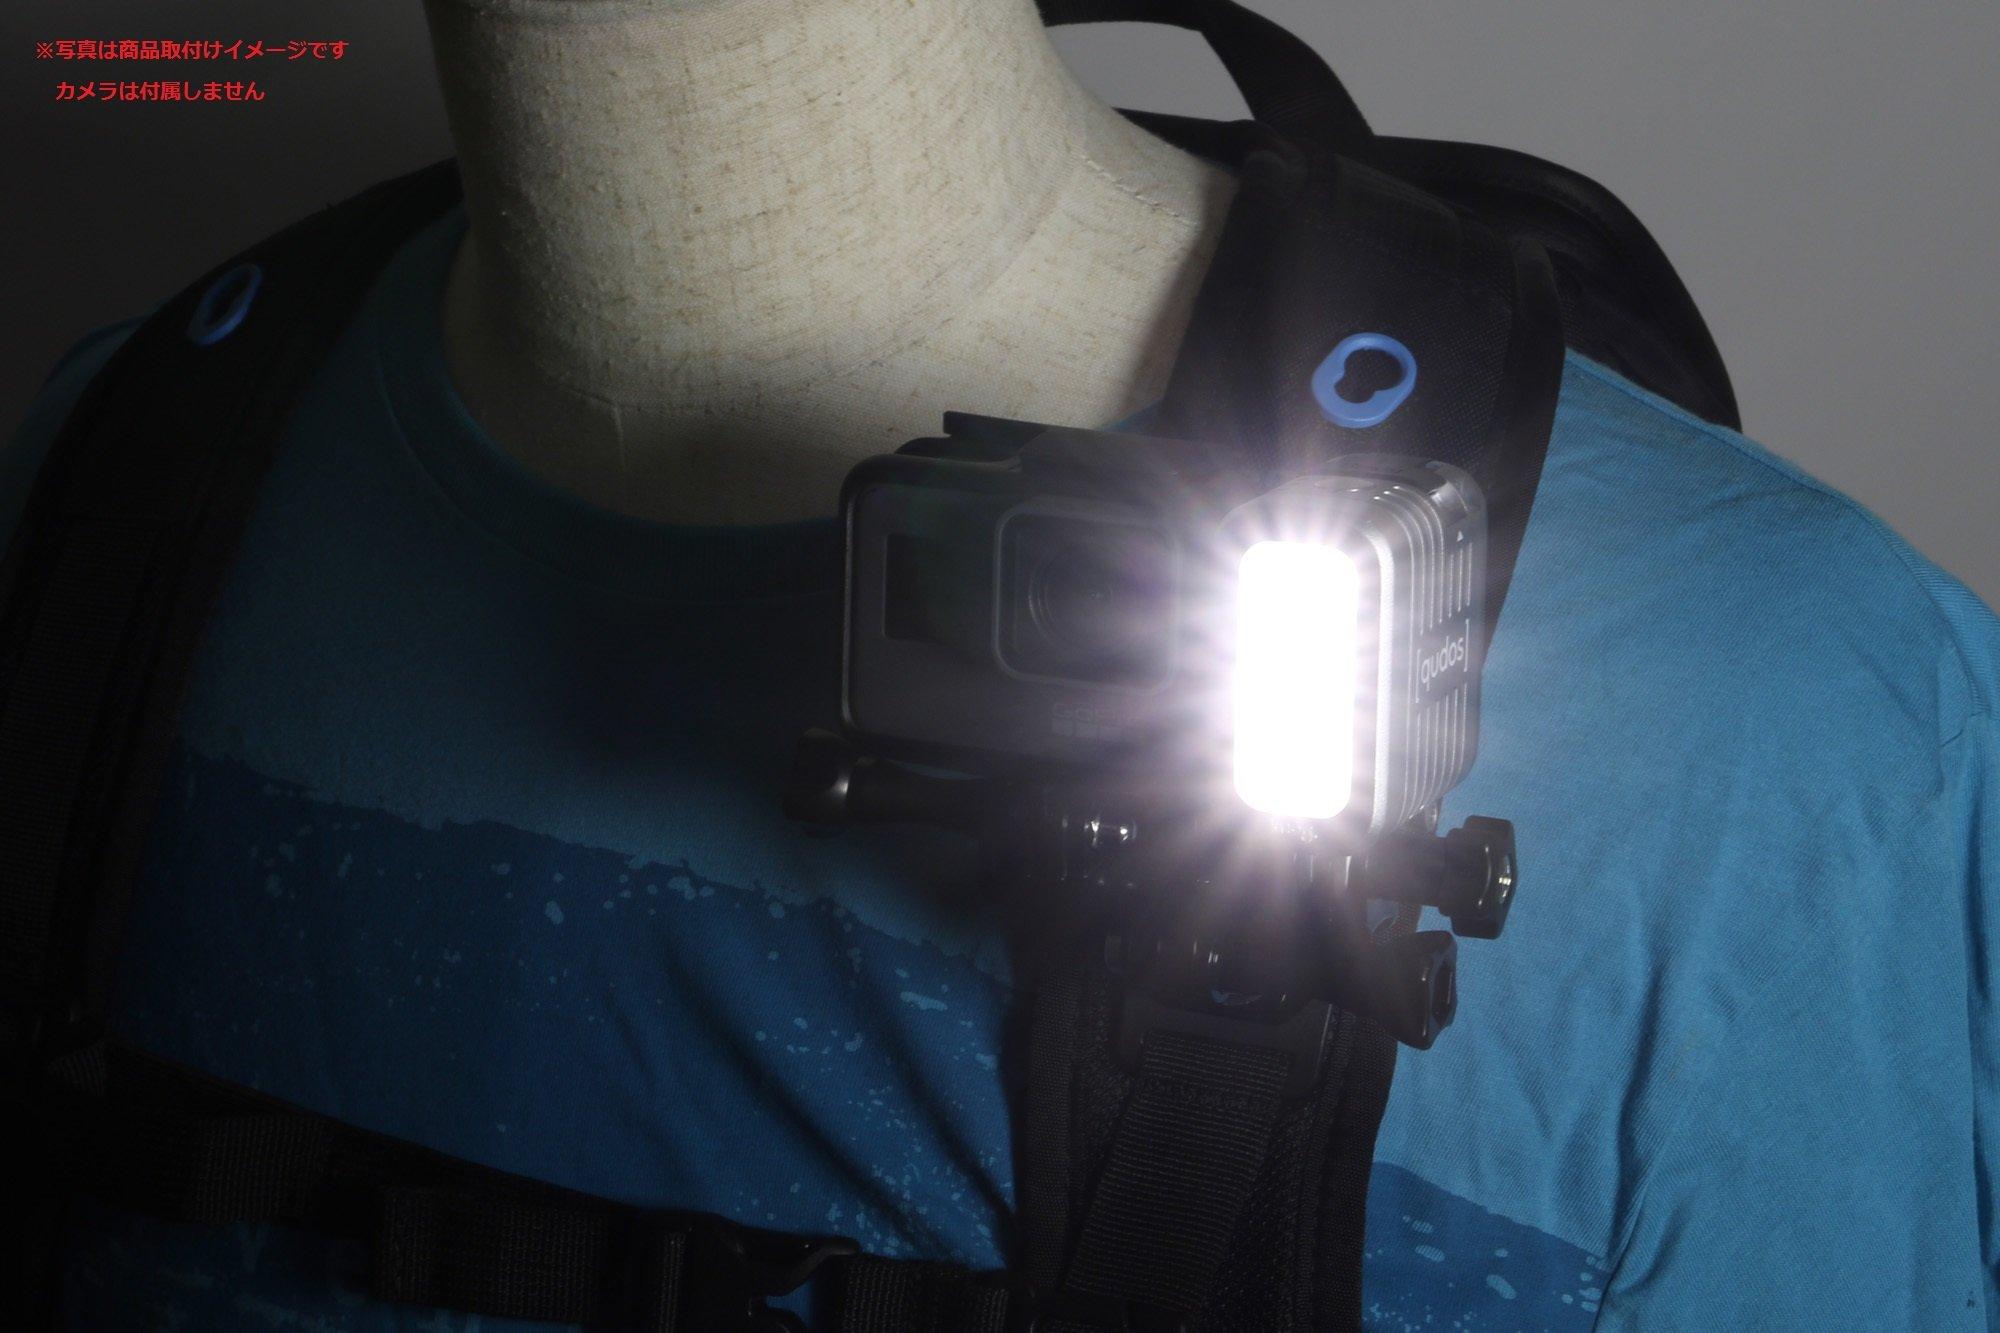 KNOG Qudos Action Video Light. Underwater GoPro Dive Light Accessories. Scuba Diving, Snorkeling.